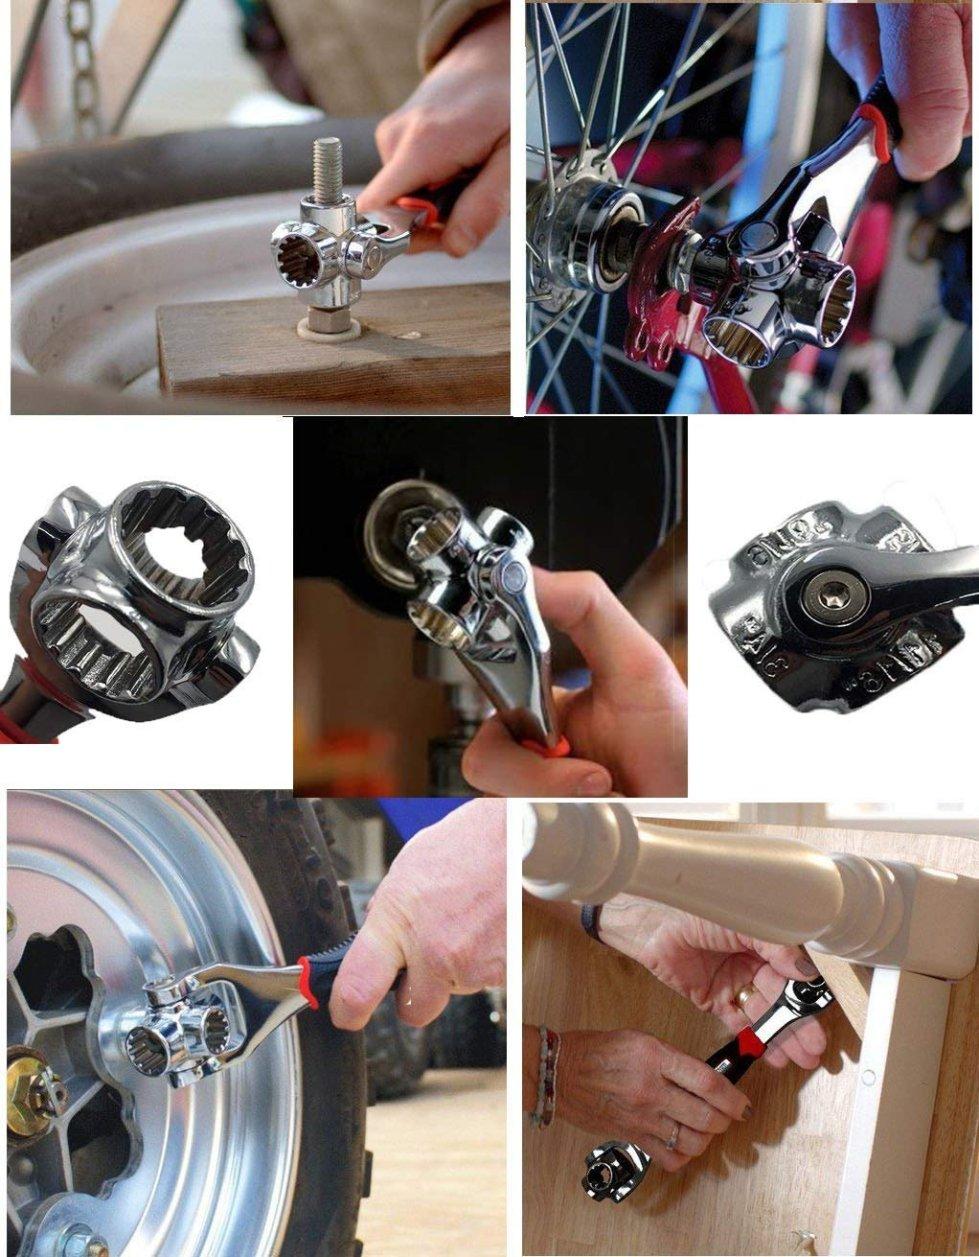 Hojo 48 in 1 Socket Wrench  Multi function  Universal Tool with Spline Bolts 360 Degree Revolving Spanner